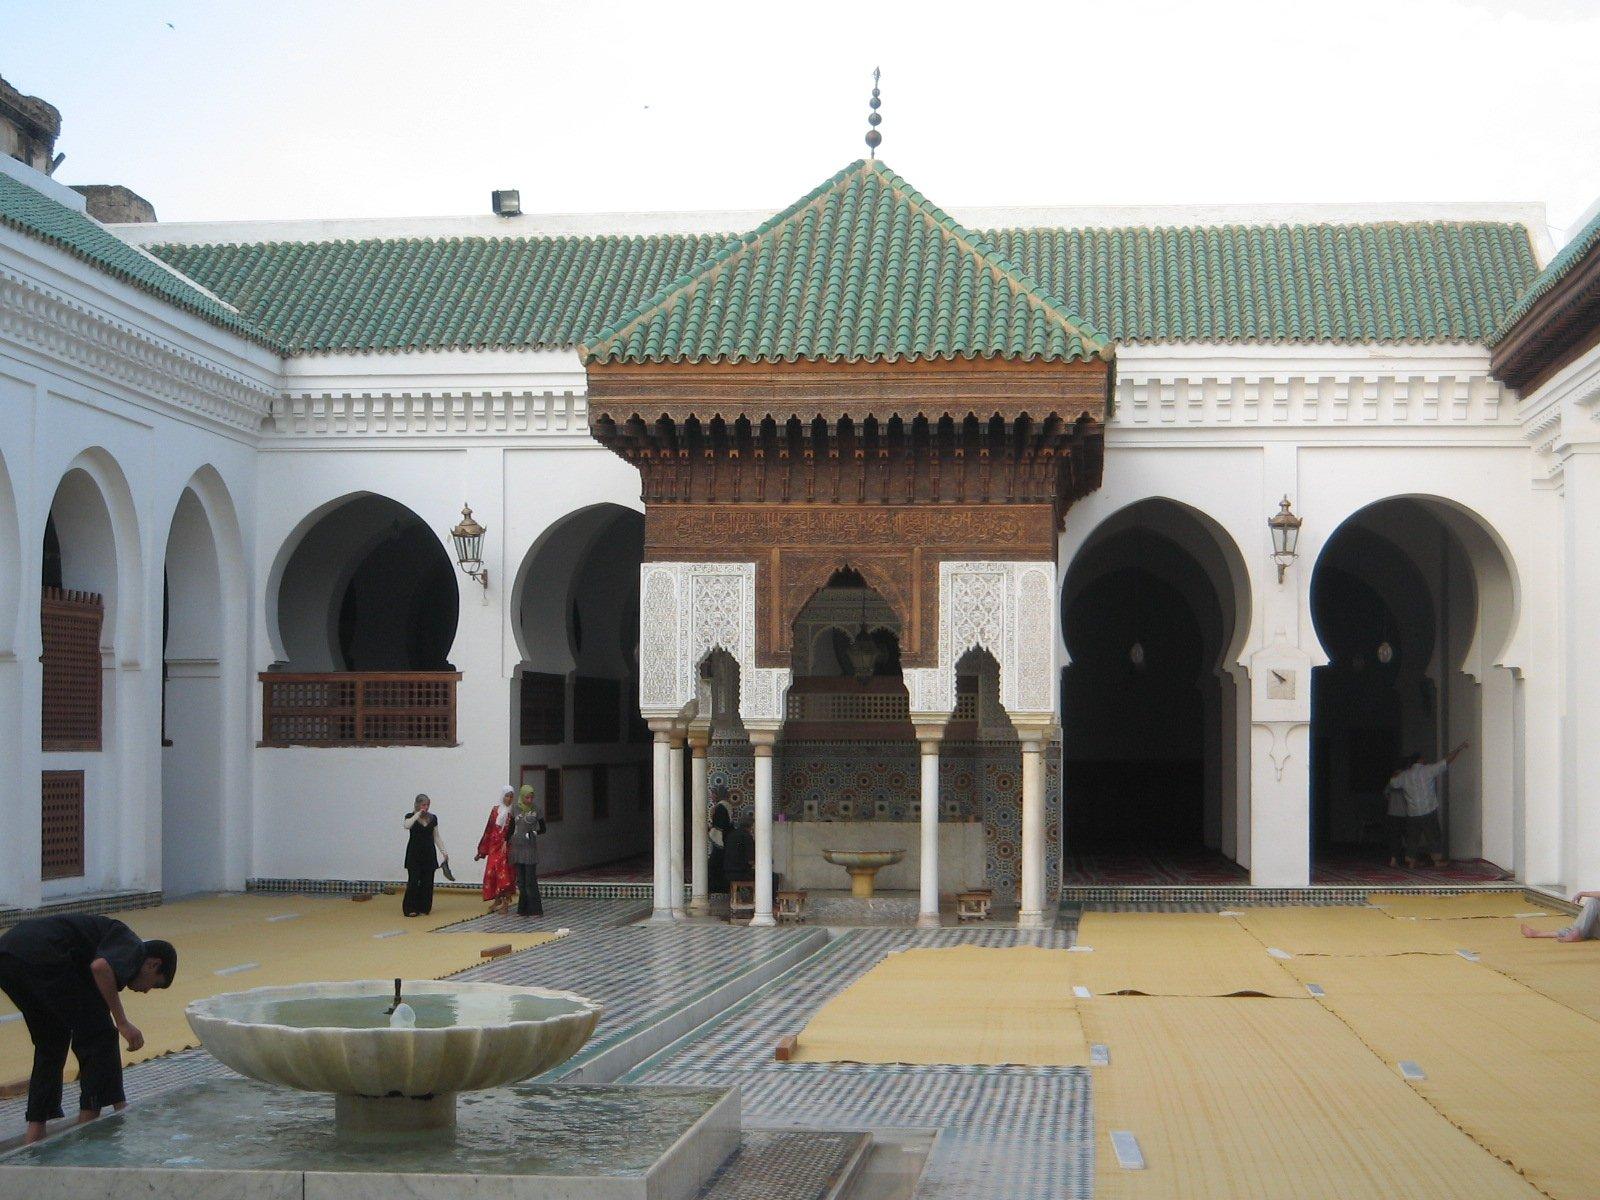 1. University of Al-Karaouine, Morocco